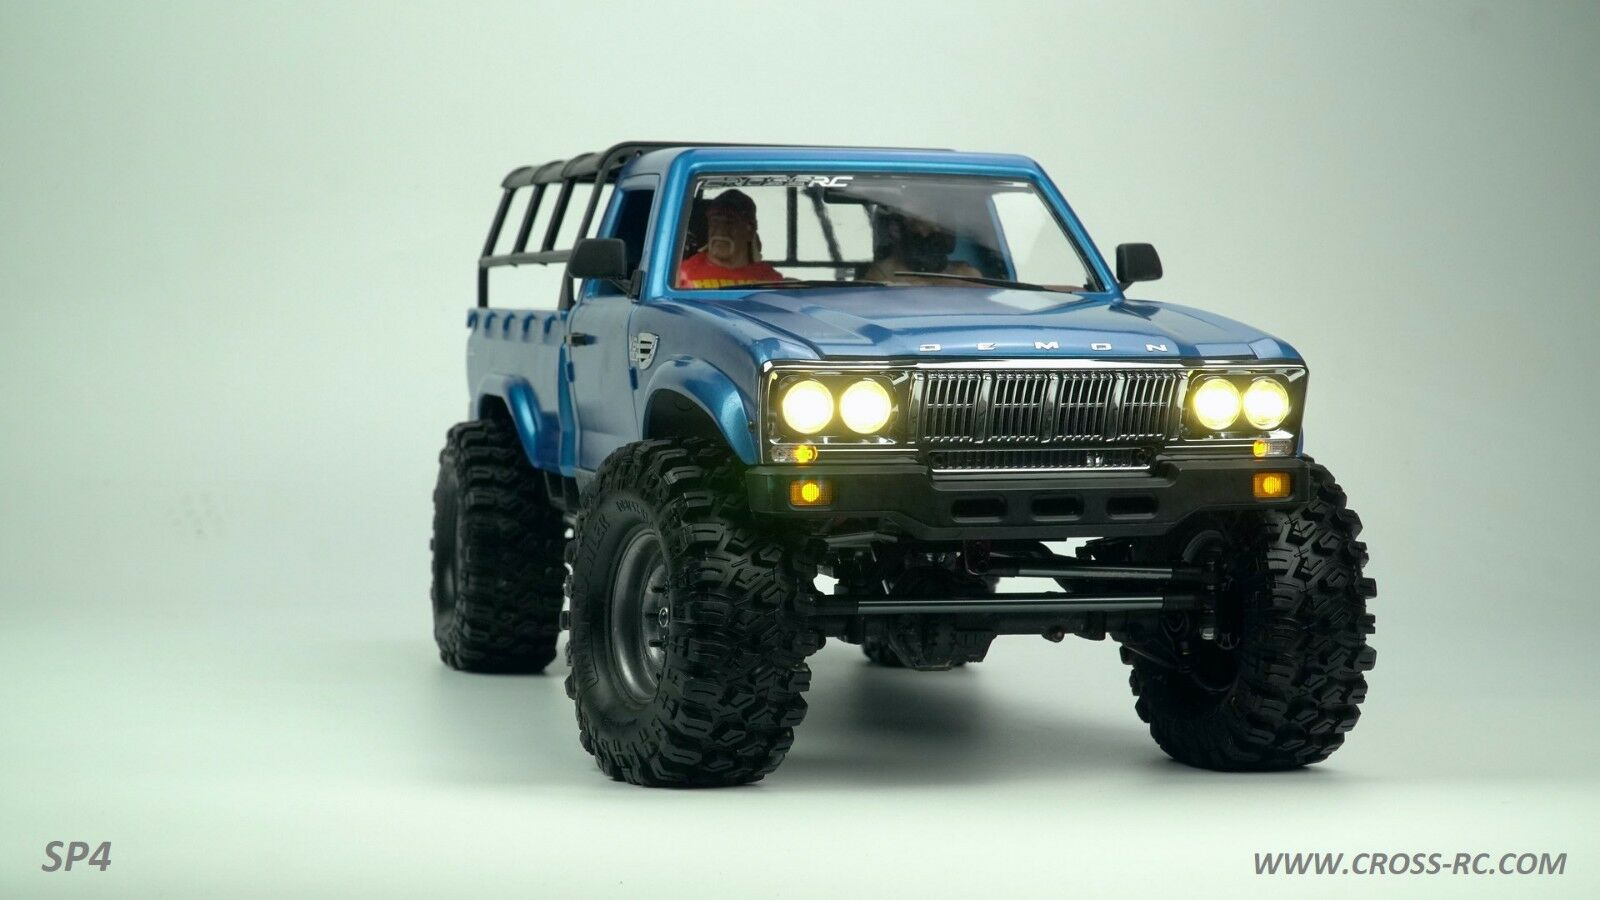 SP4C 1 10 Demon 4x4 Crawler  Kit-Full Hard corpo Full Metal, CNC Rims CZRSP4C  fino al 60% di sconto